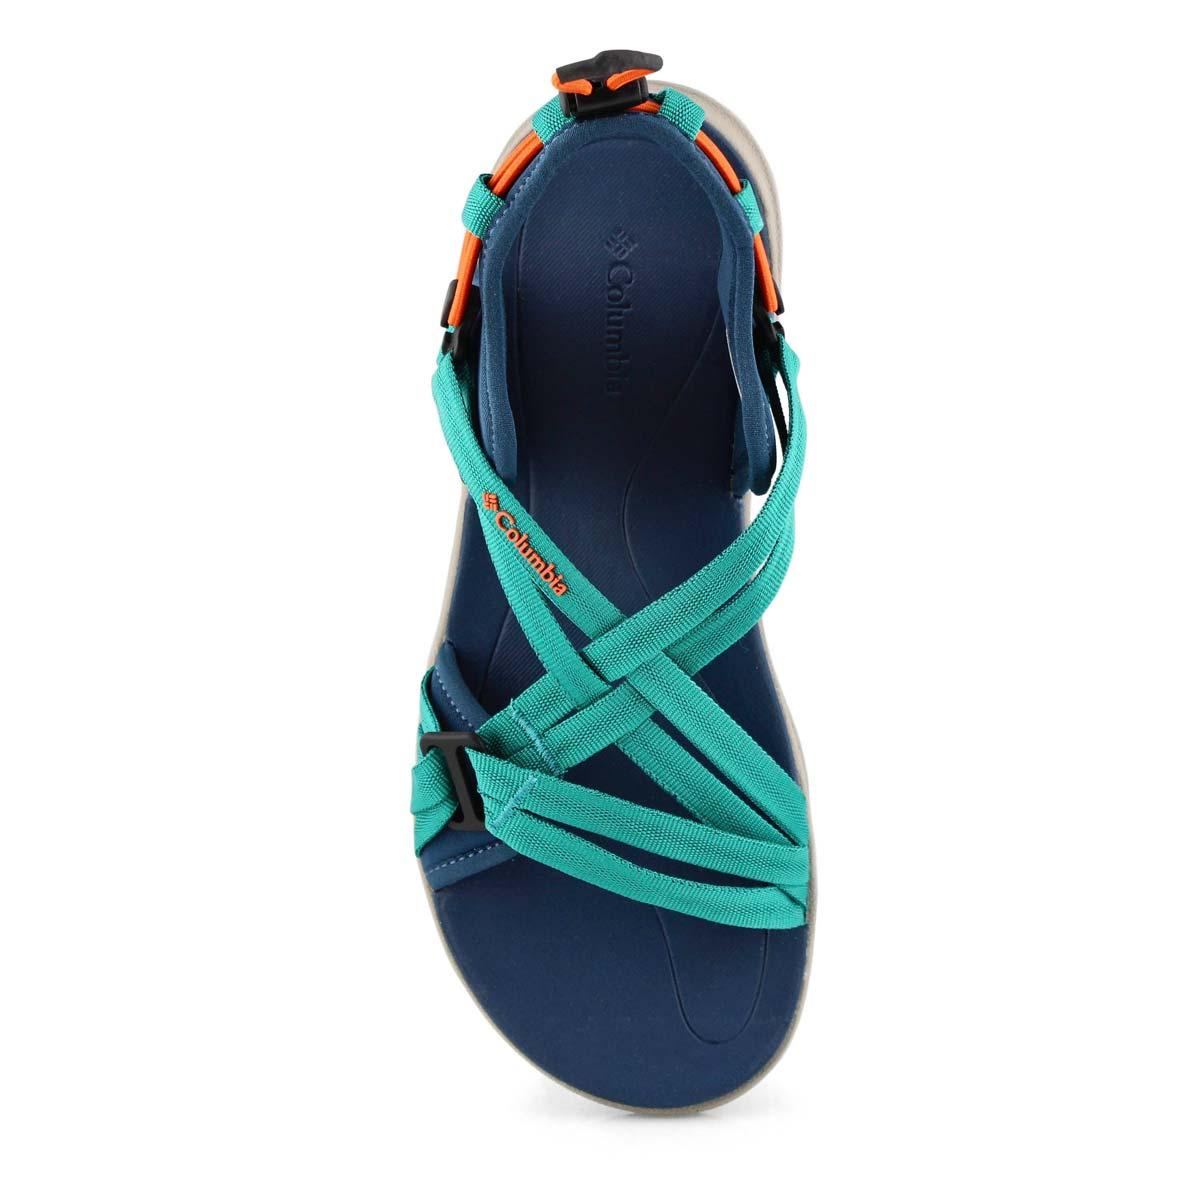 Lds Columbia Sandal blue sport sandal